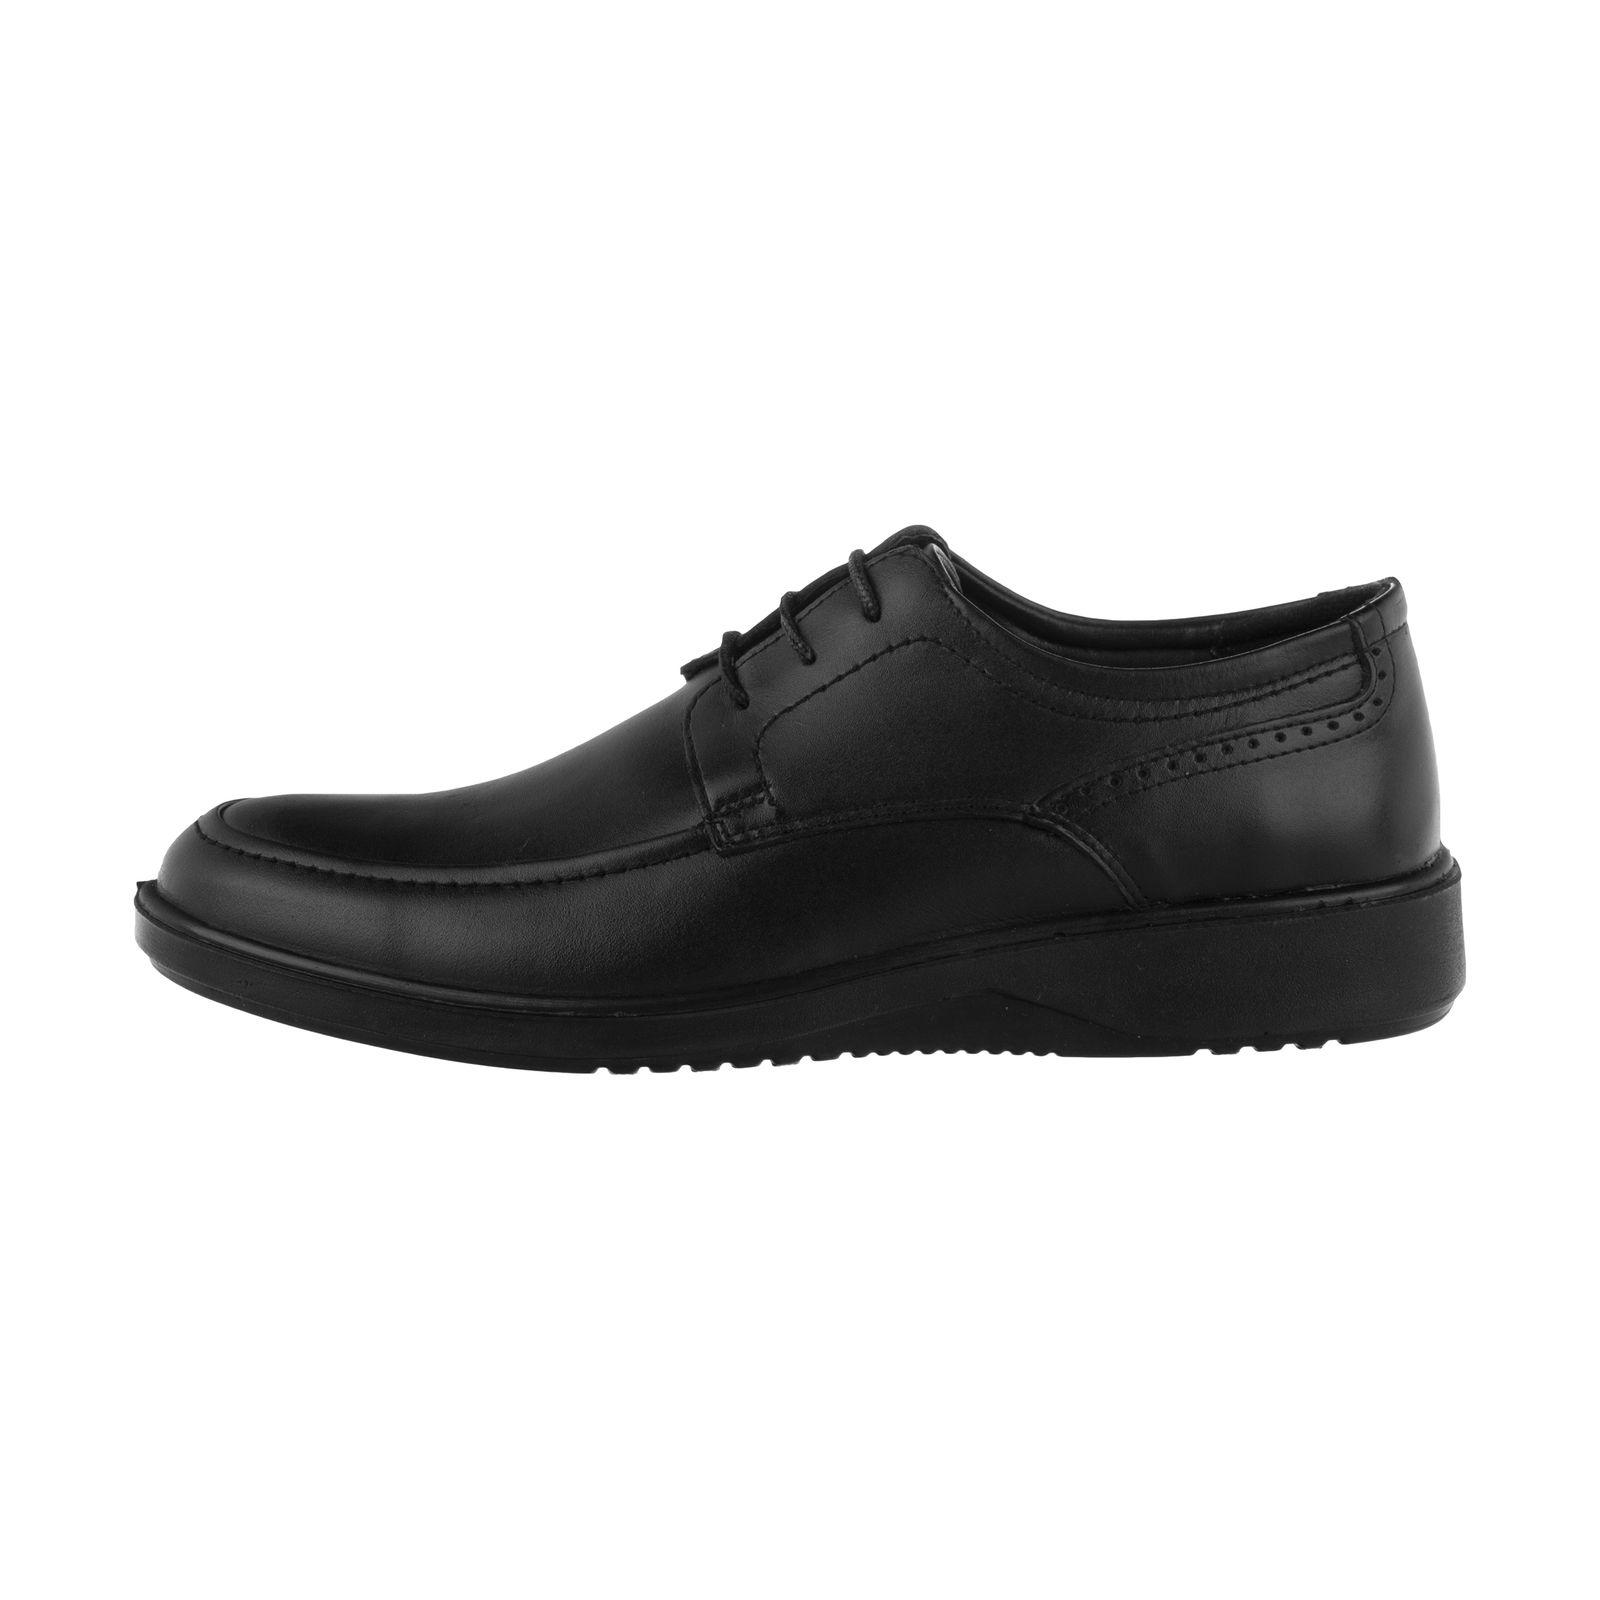 کفش روزمره مردانه سوته مدل 4994E503101 -  - 2